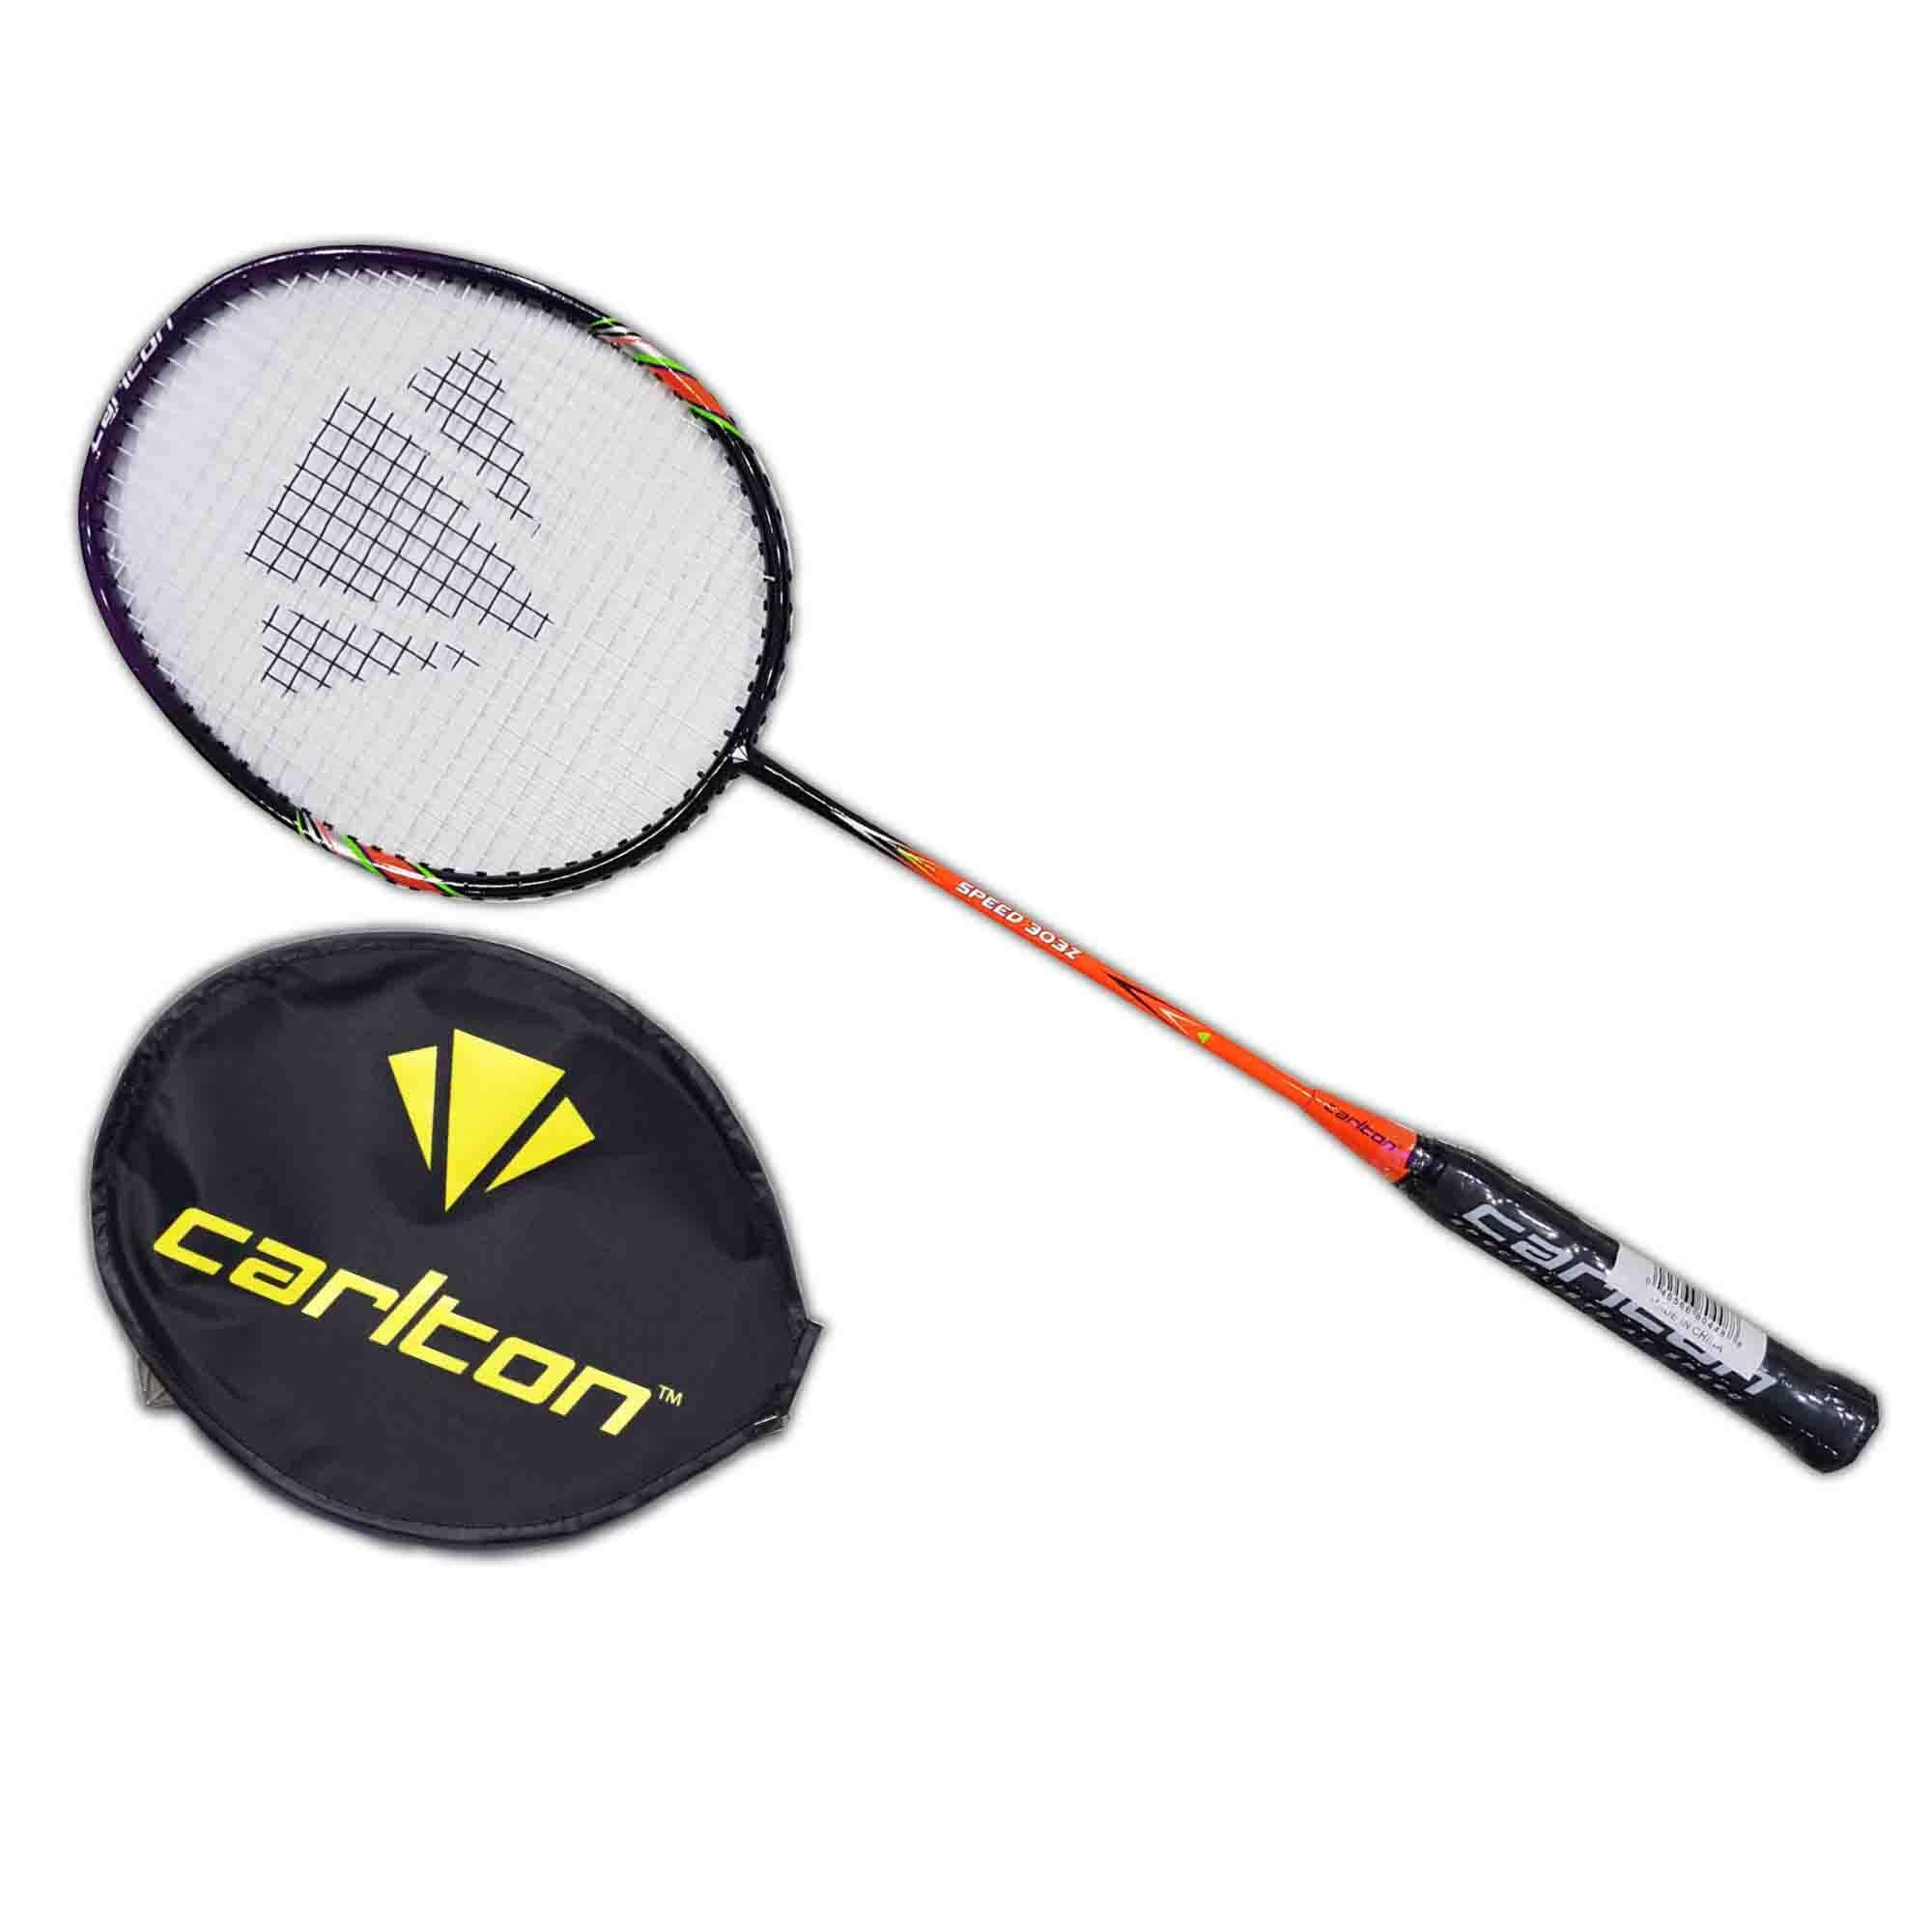 Carlton Badminton Racket Speed 303